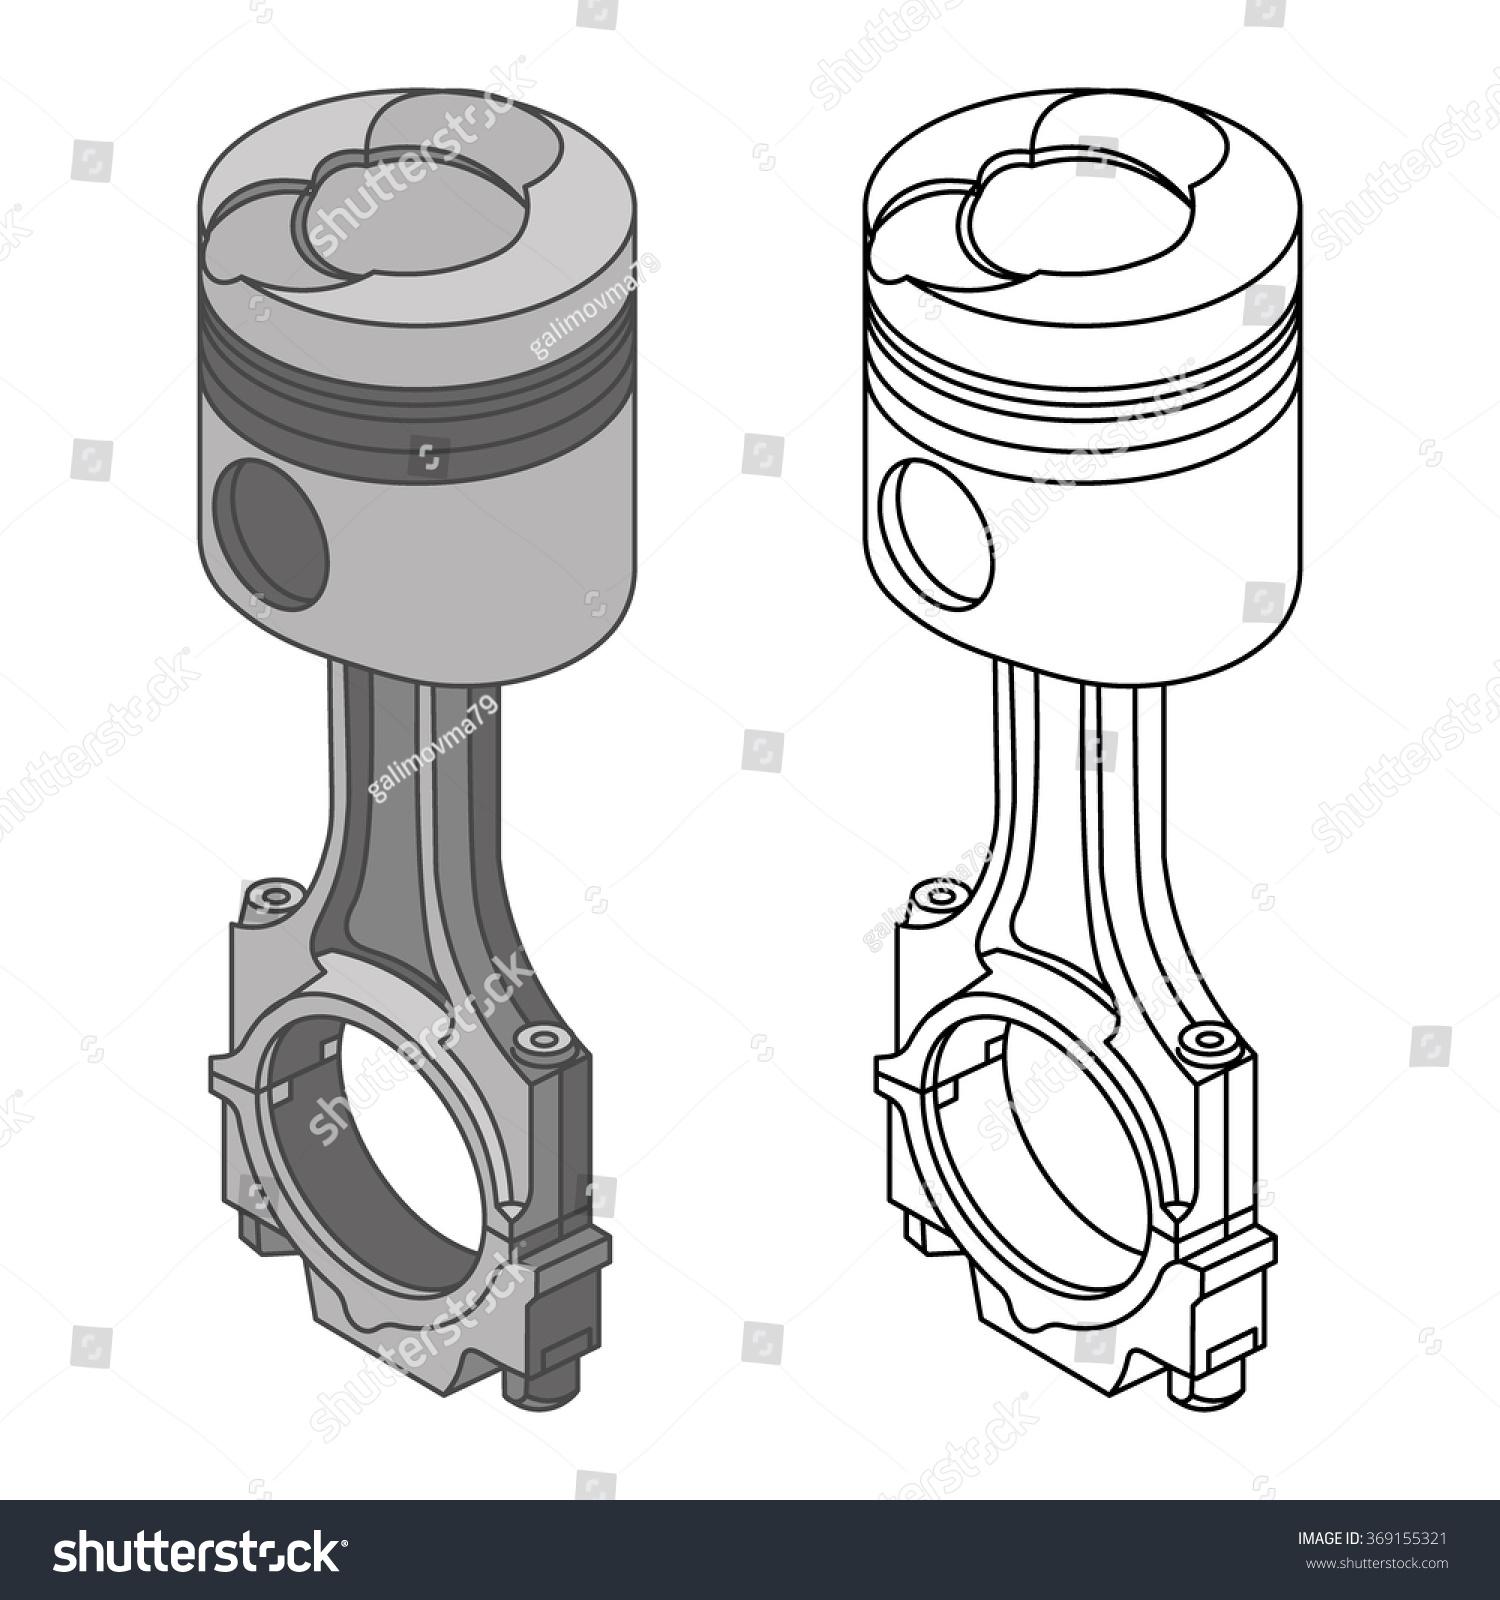 Brilliant B18B1 Wiring Diagram Wiring Diagram Wiring 101 Louspimsautoservicenl